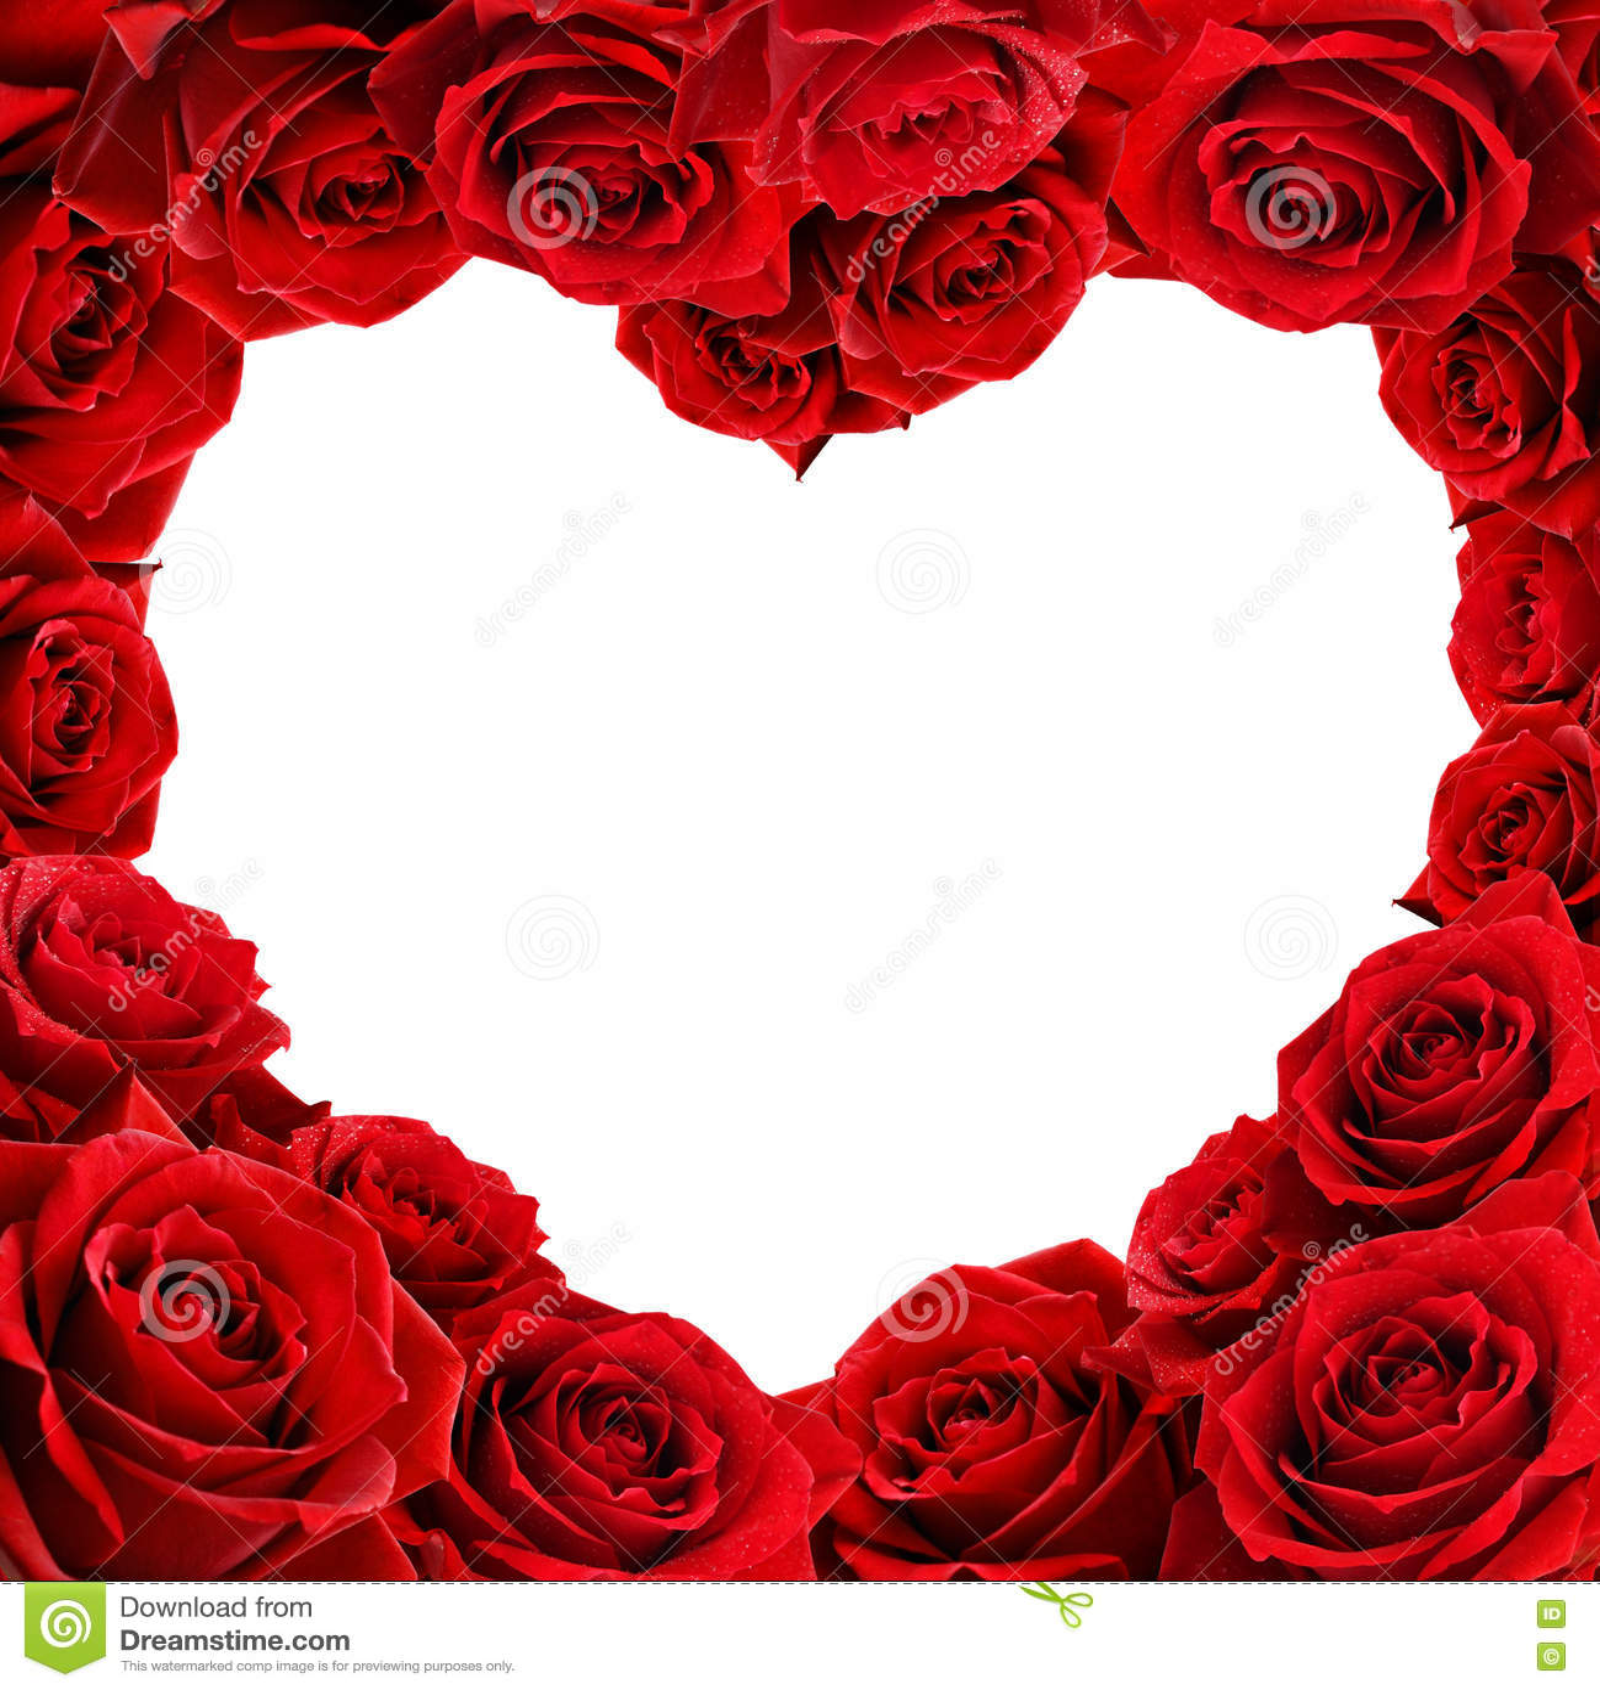 Red Rose Frame In The Shape Of Heart Vector Illustration